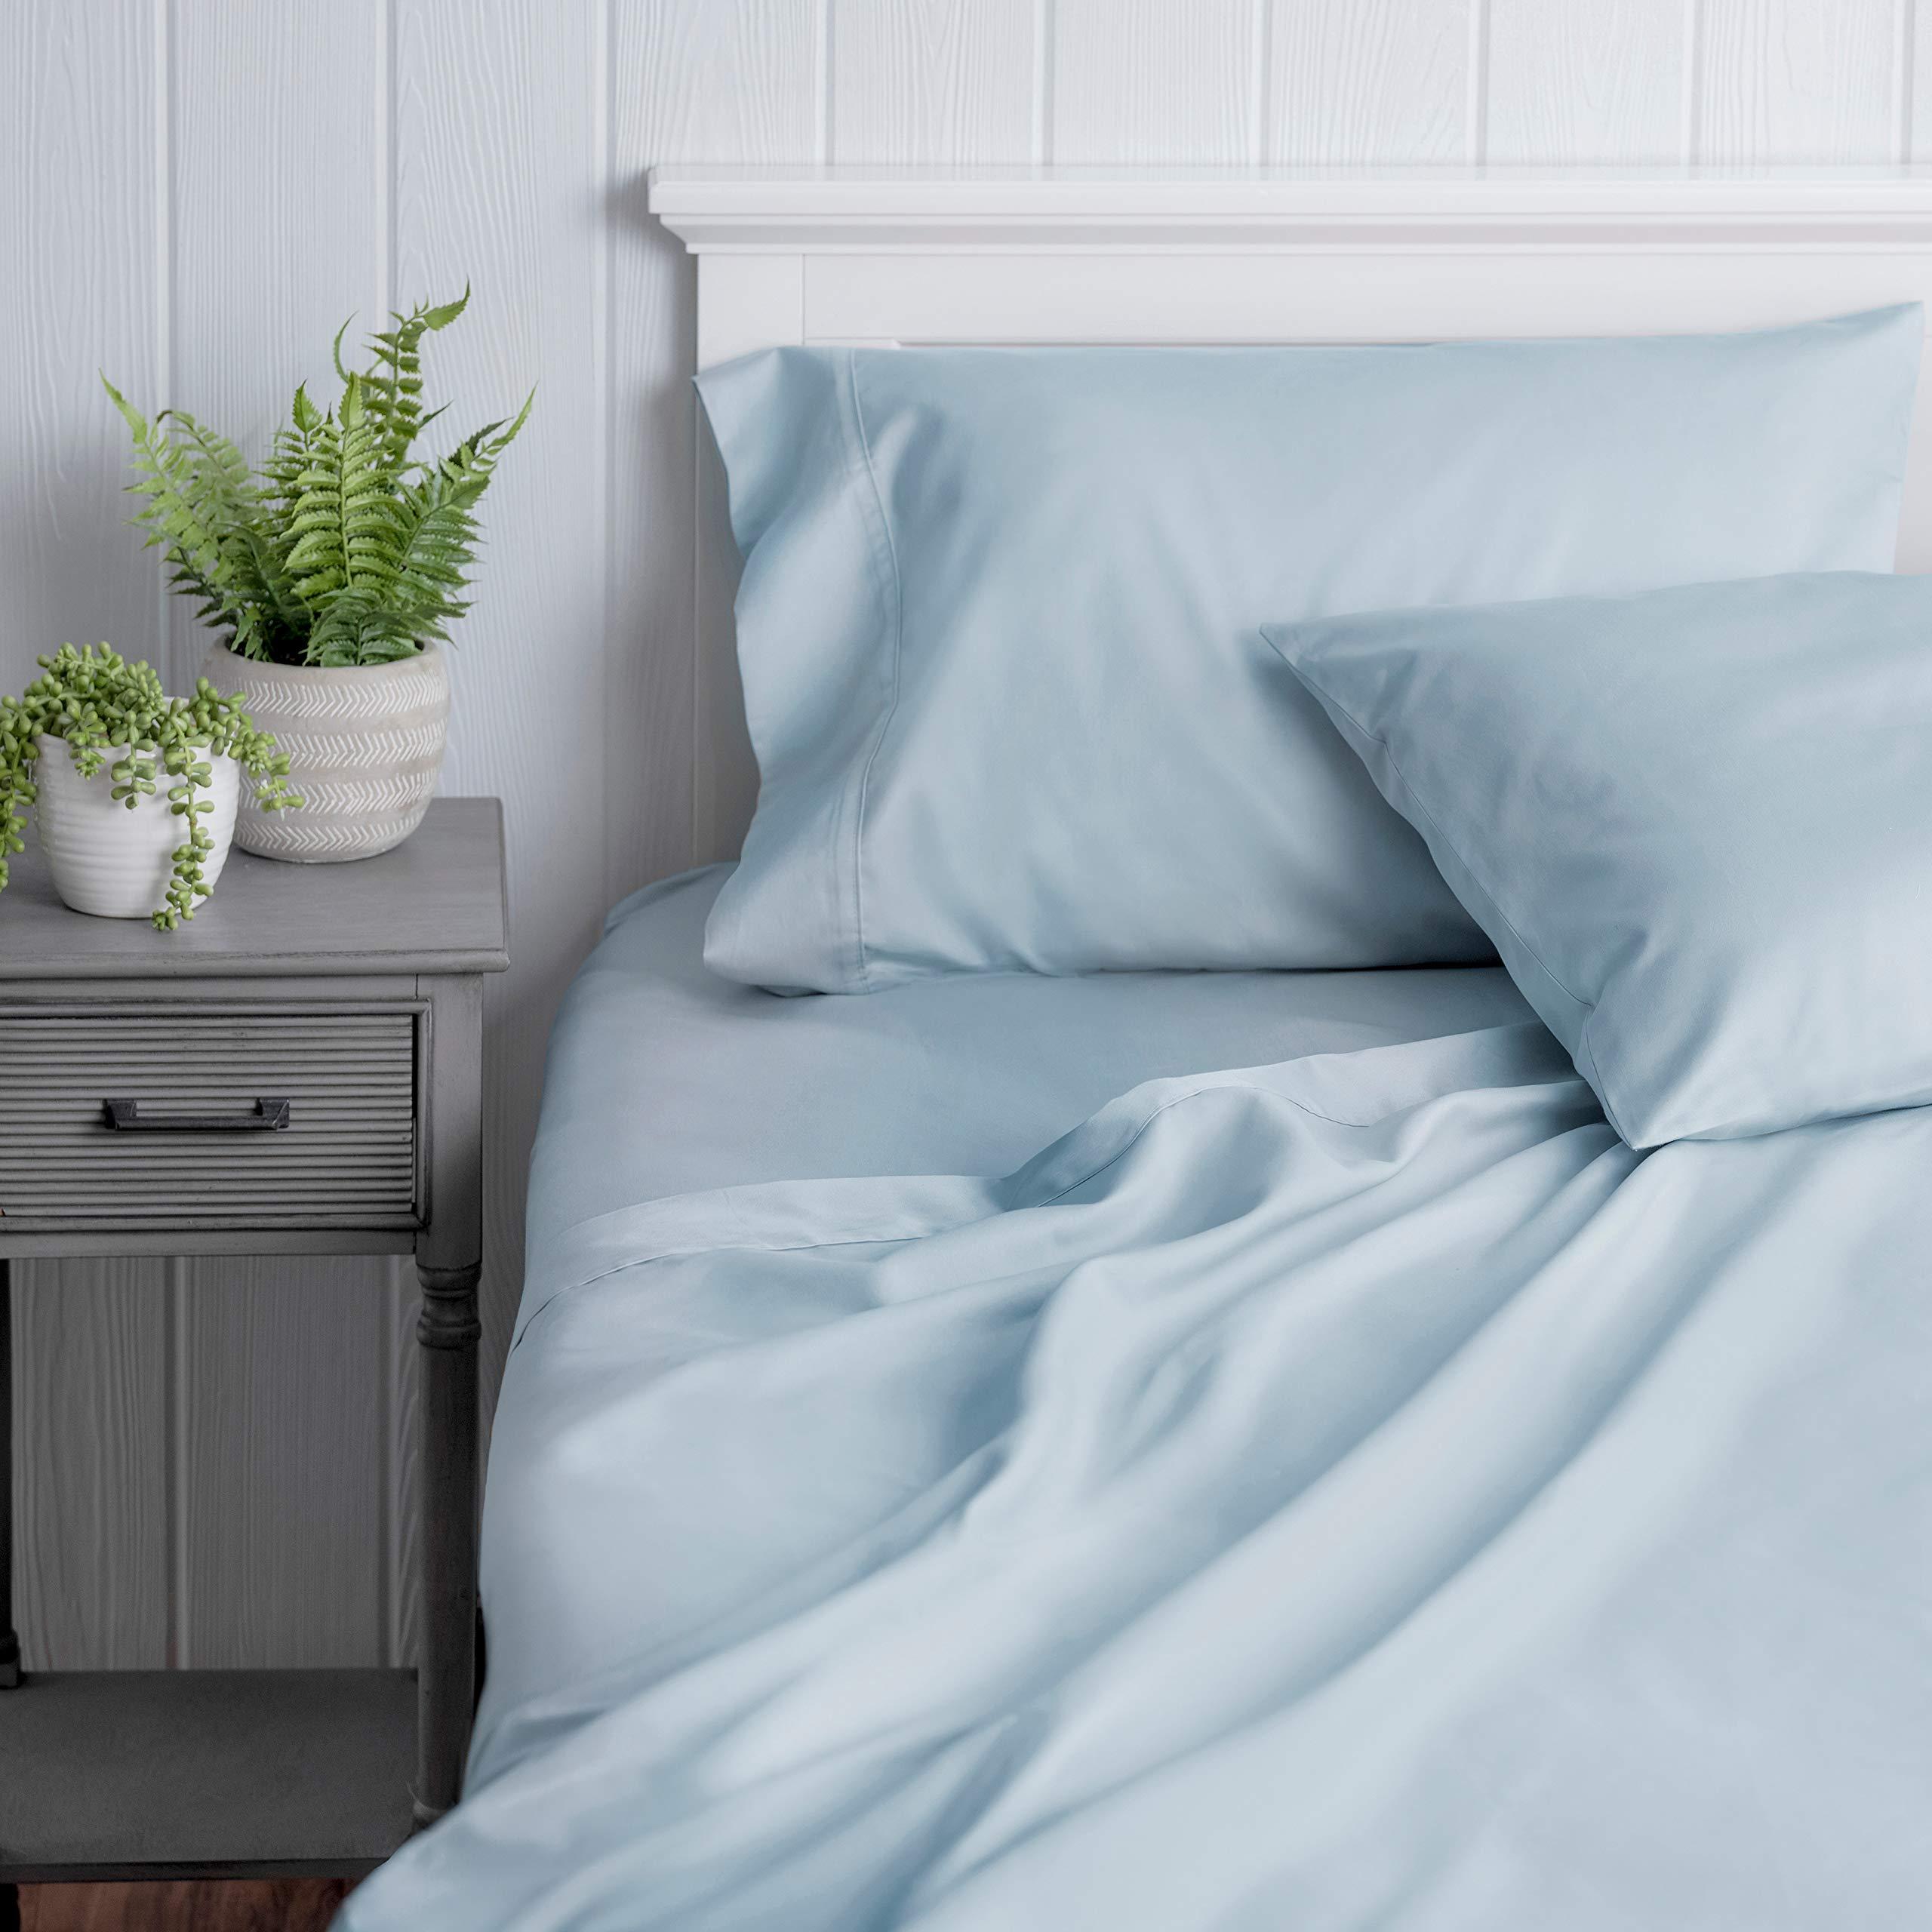 Welhome 100% Cotton Sateen Full Sheet Set - 4 Piece - Luxurious - Super Soft & Cozy - Durable - Classic - All Season Bed Sheet Set - Deep Pocket - Easy fit -Powder Blue